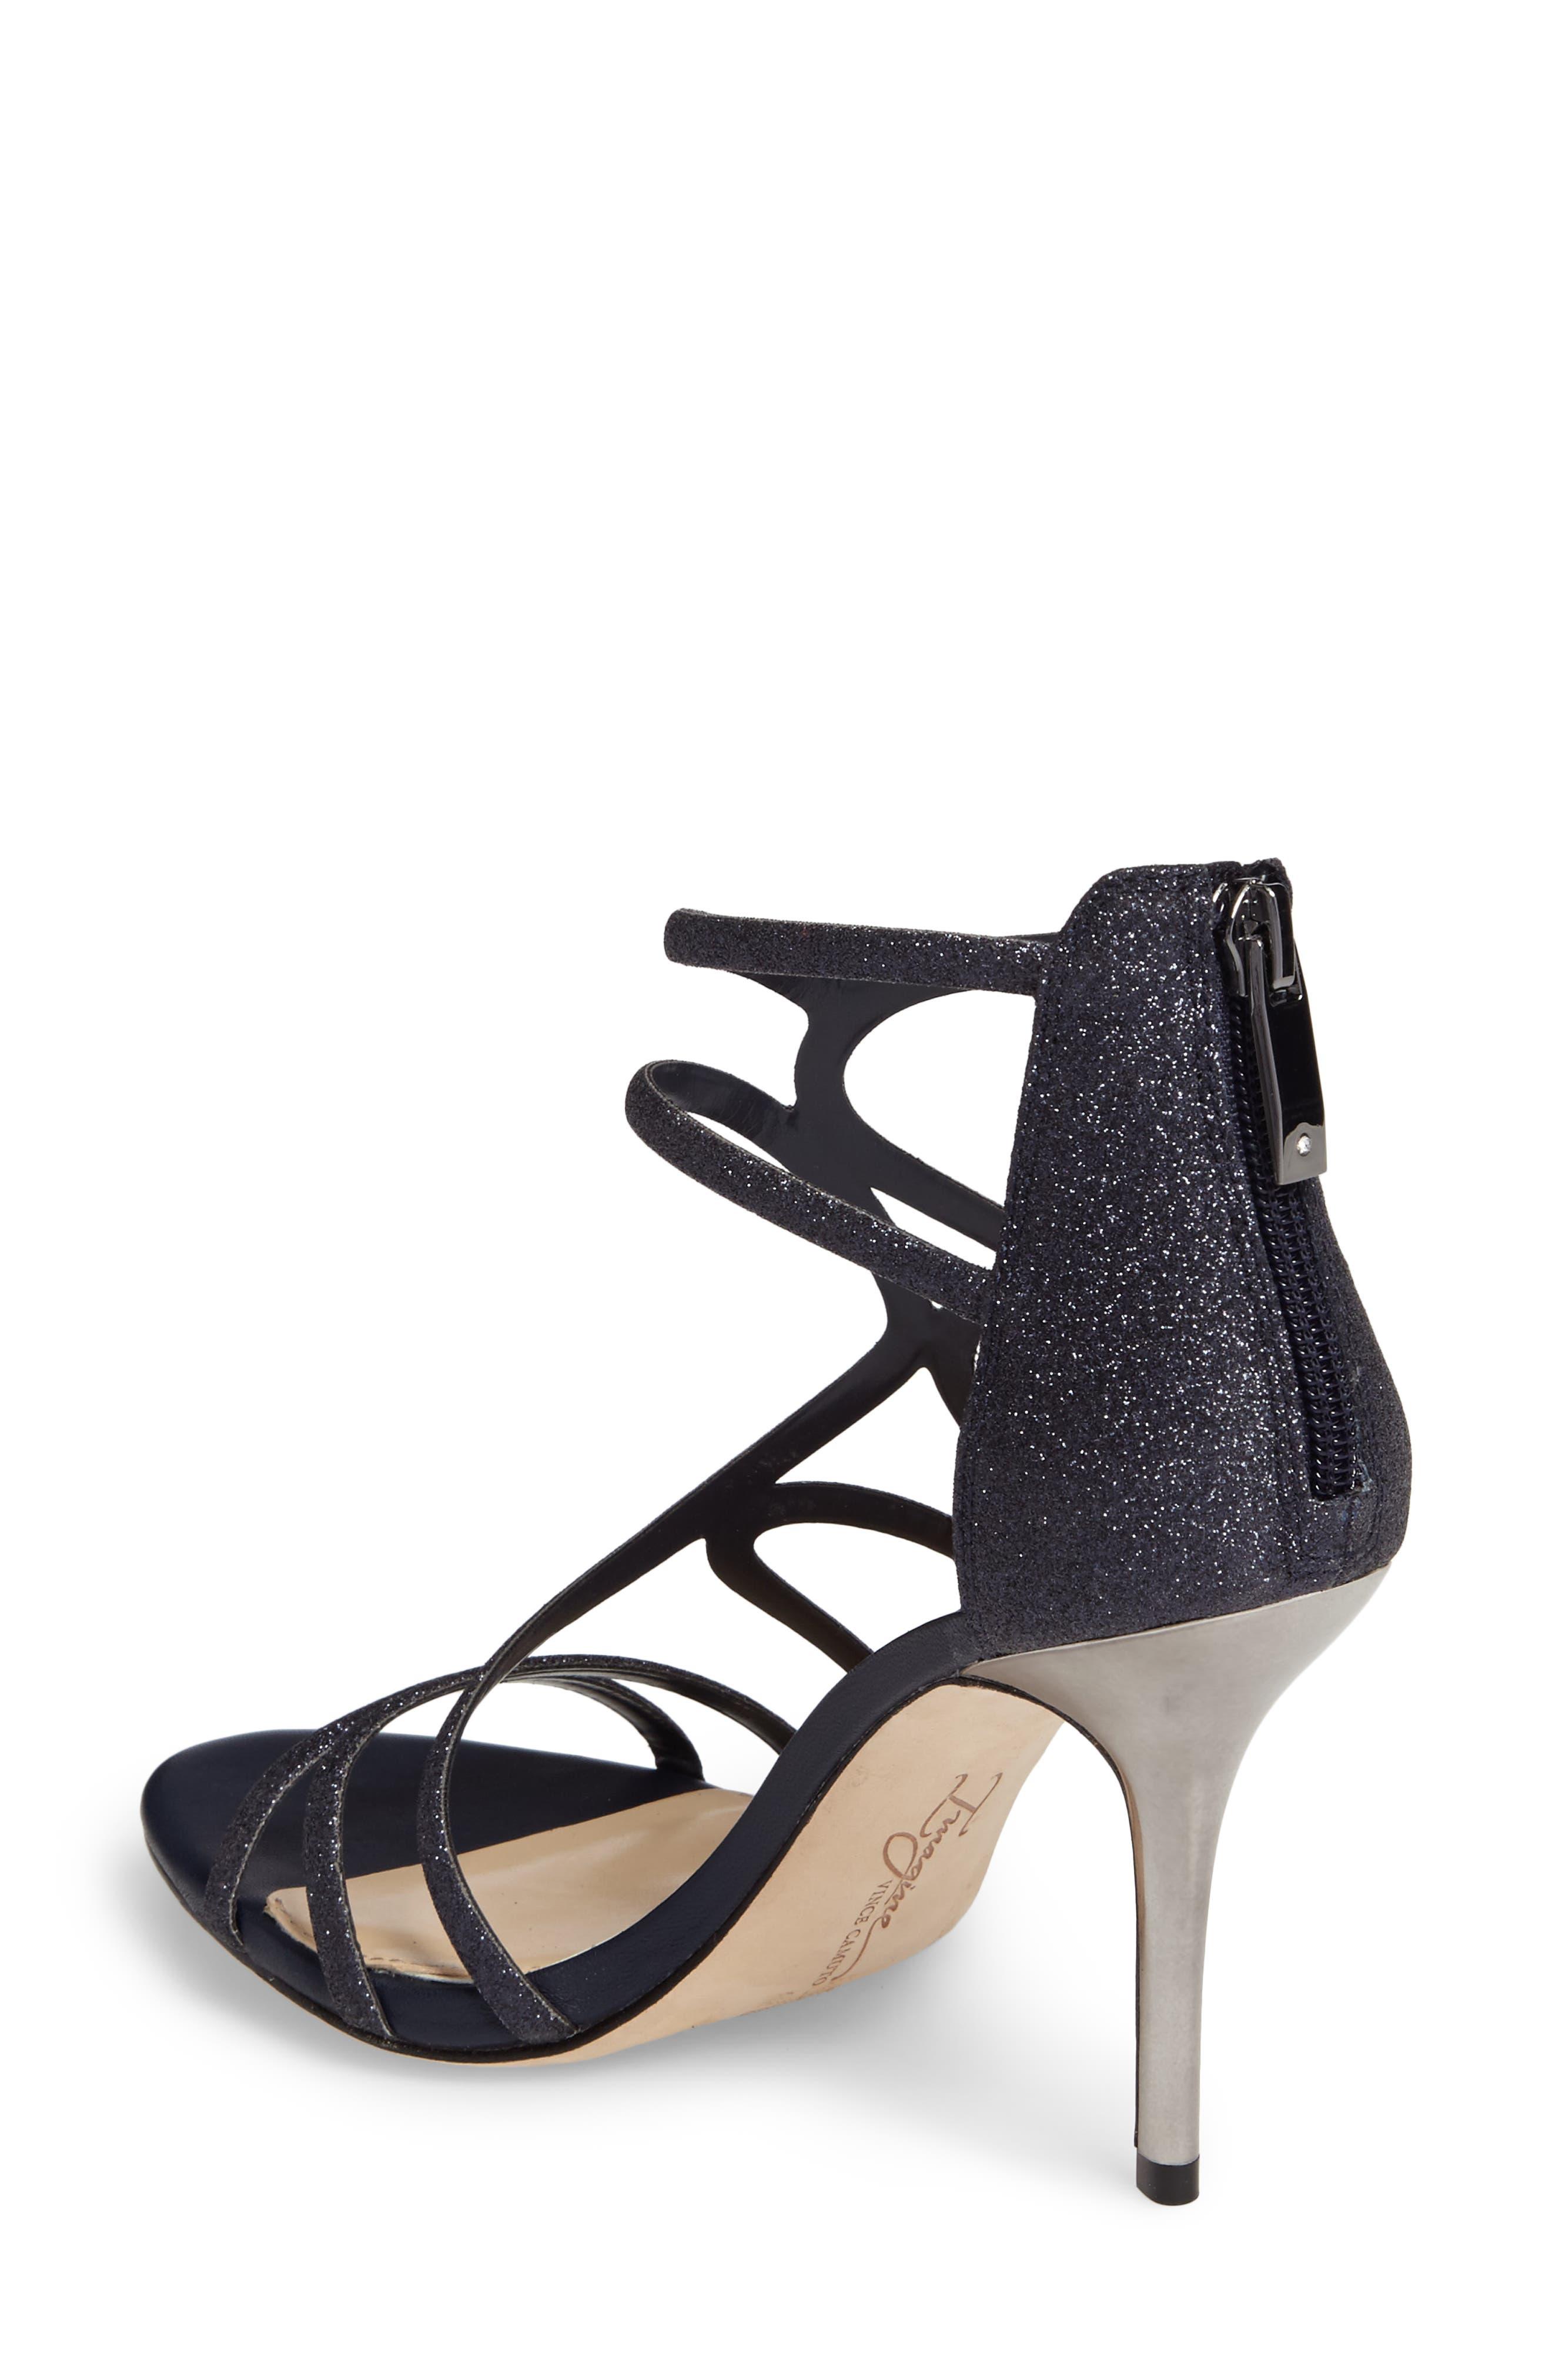 'Ranee' Dress Sandal,                             Alternate thumbnail 11, color,